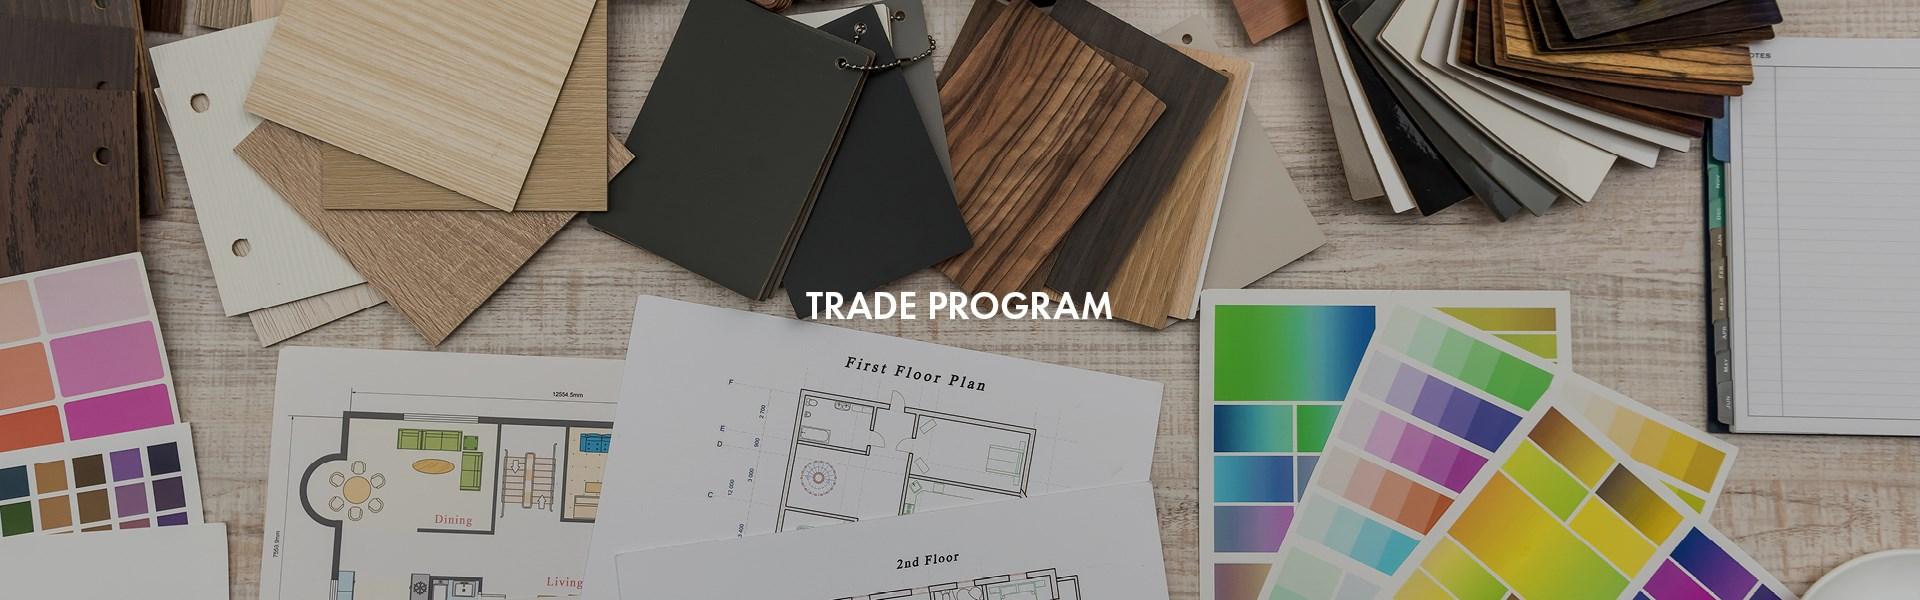 Trade Program